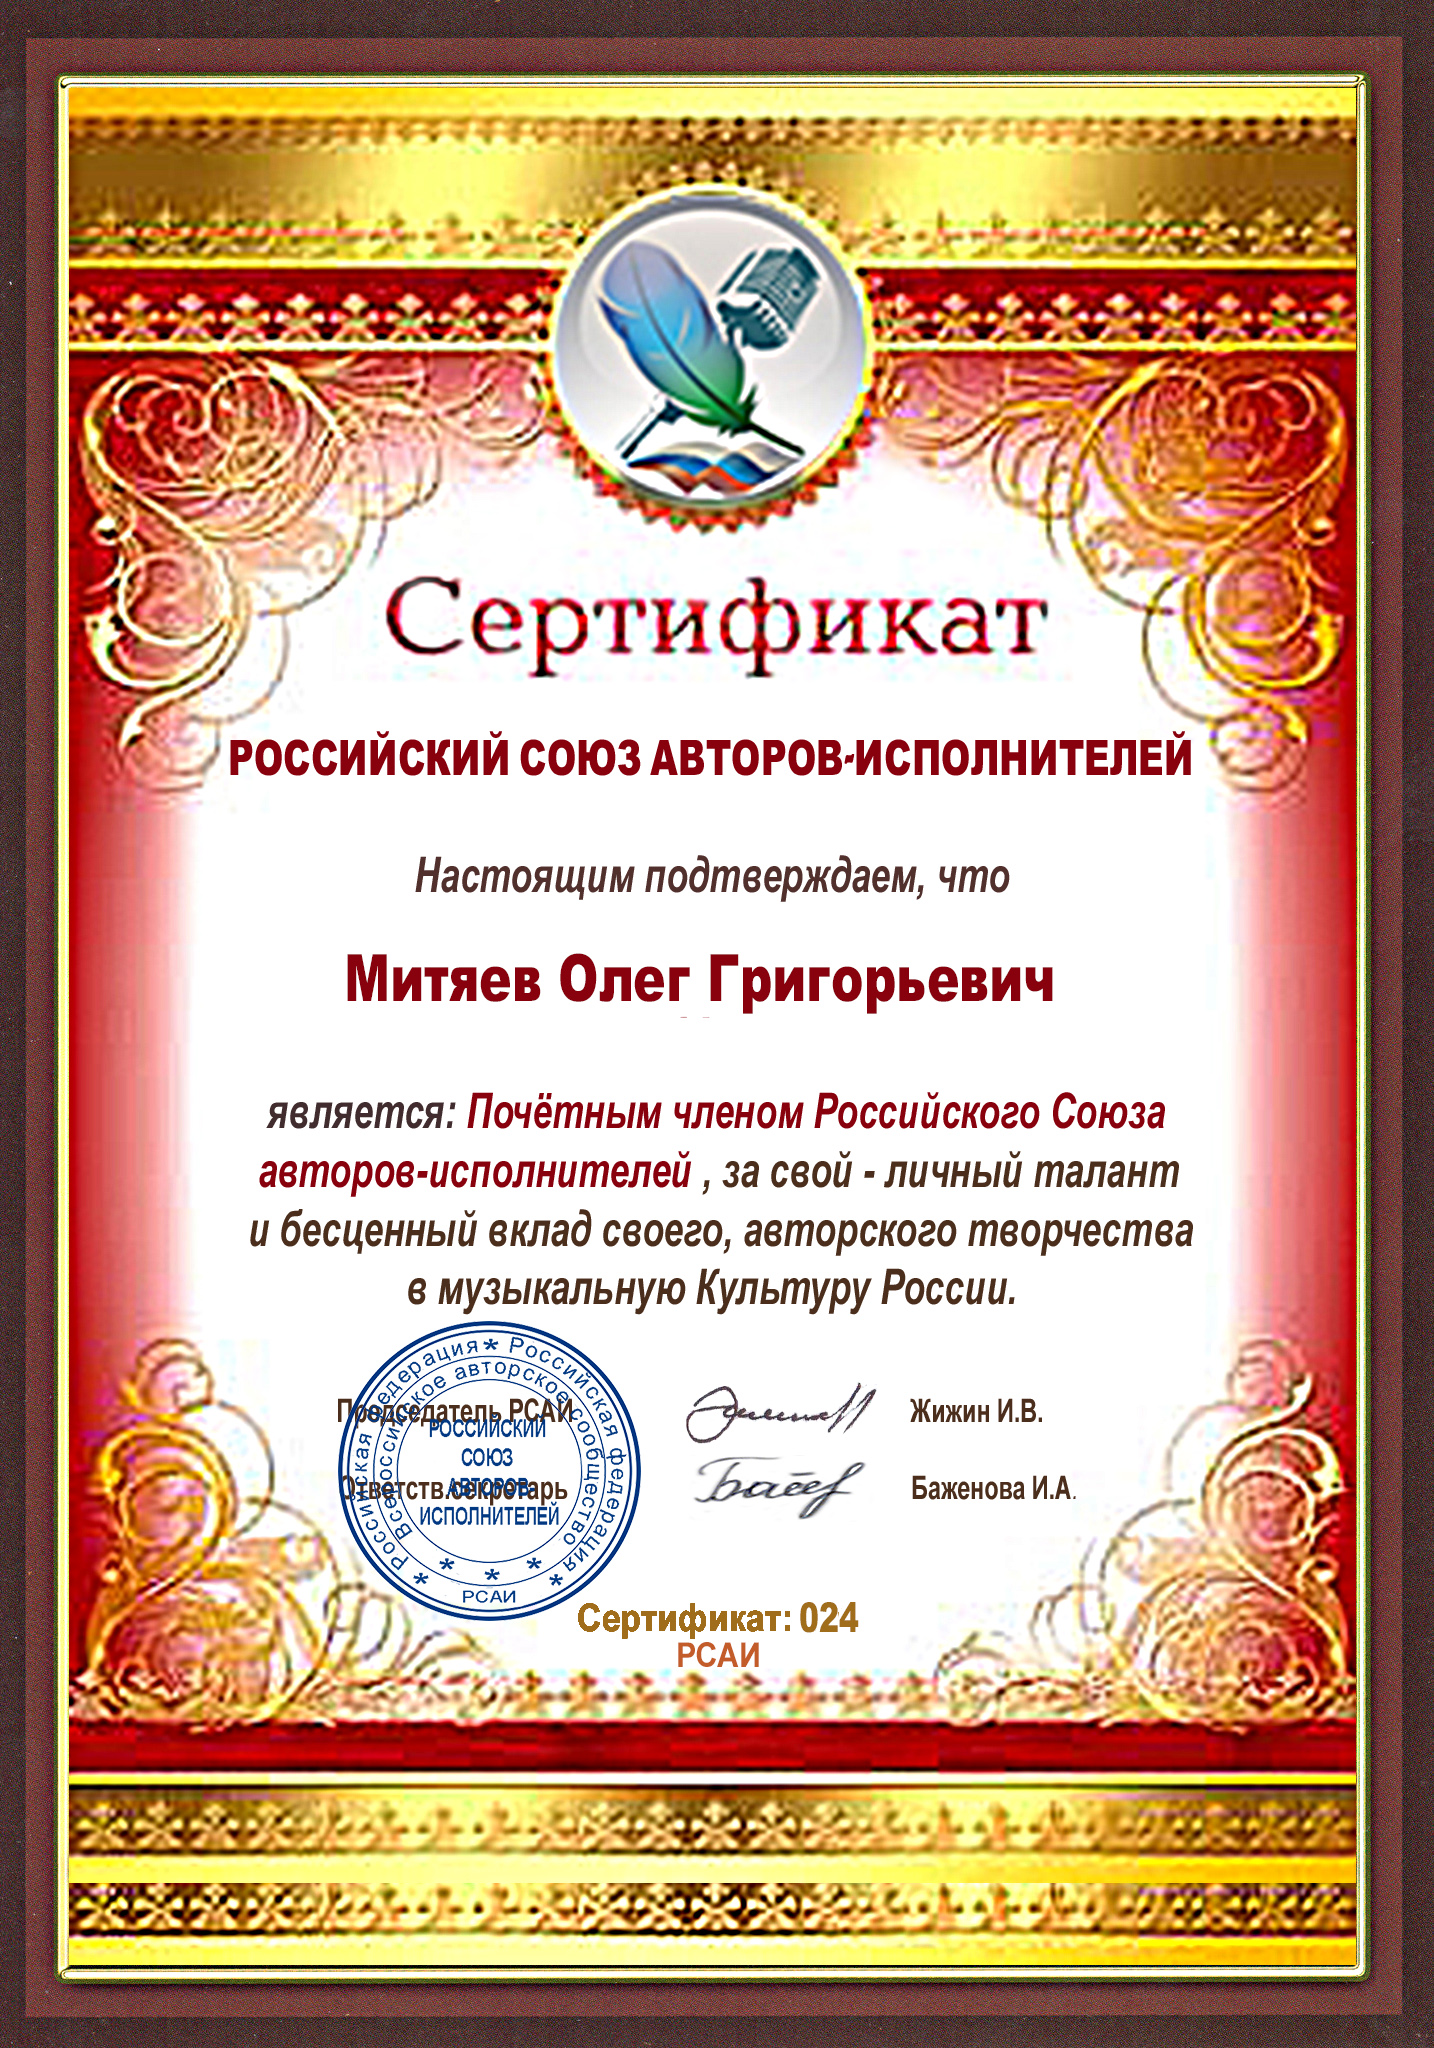 сертификат рсаи24